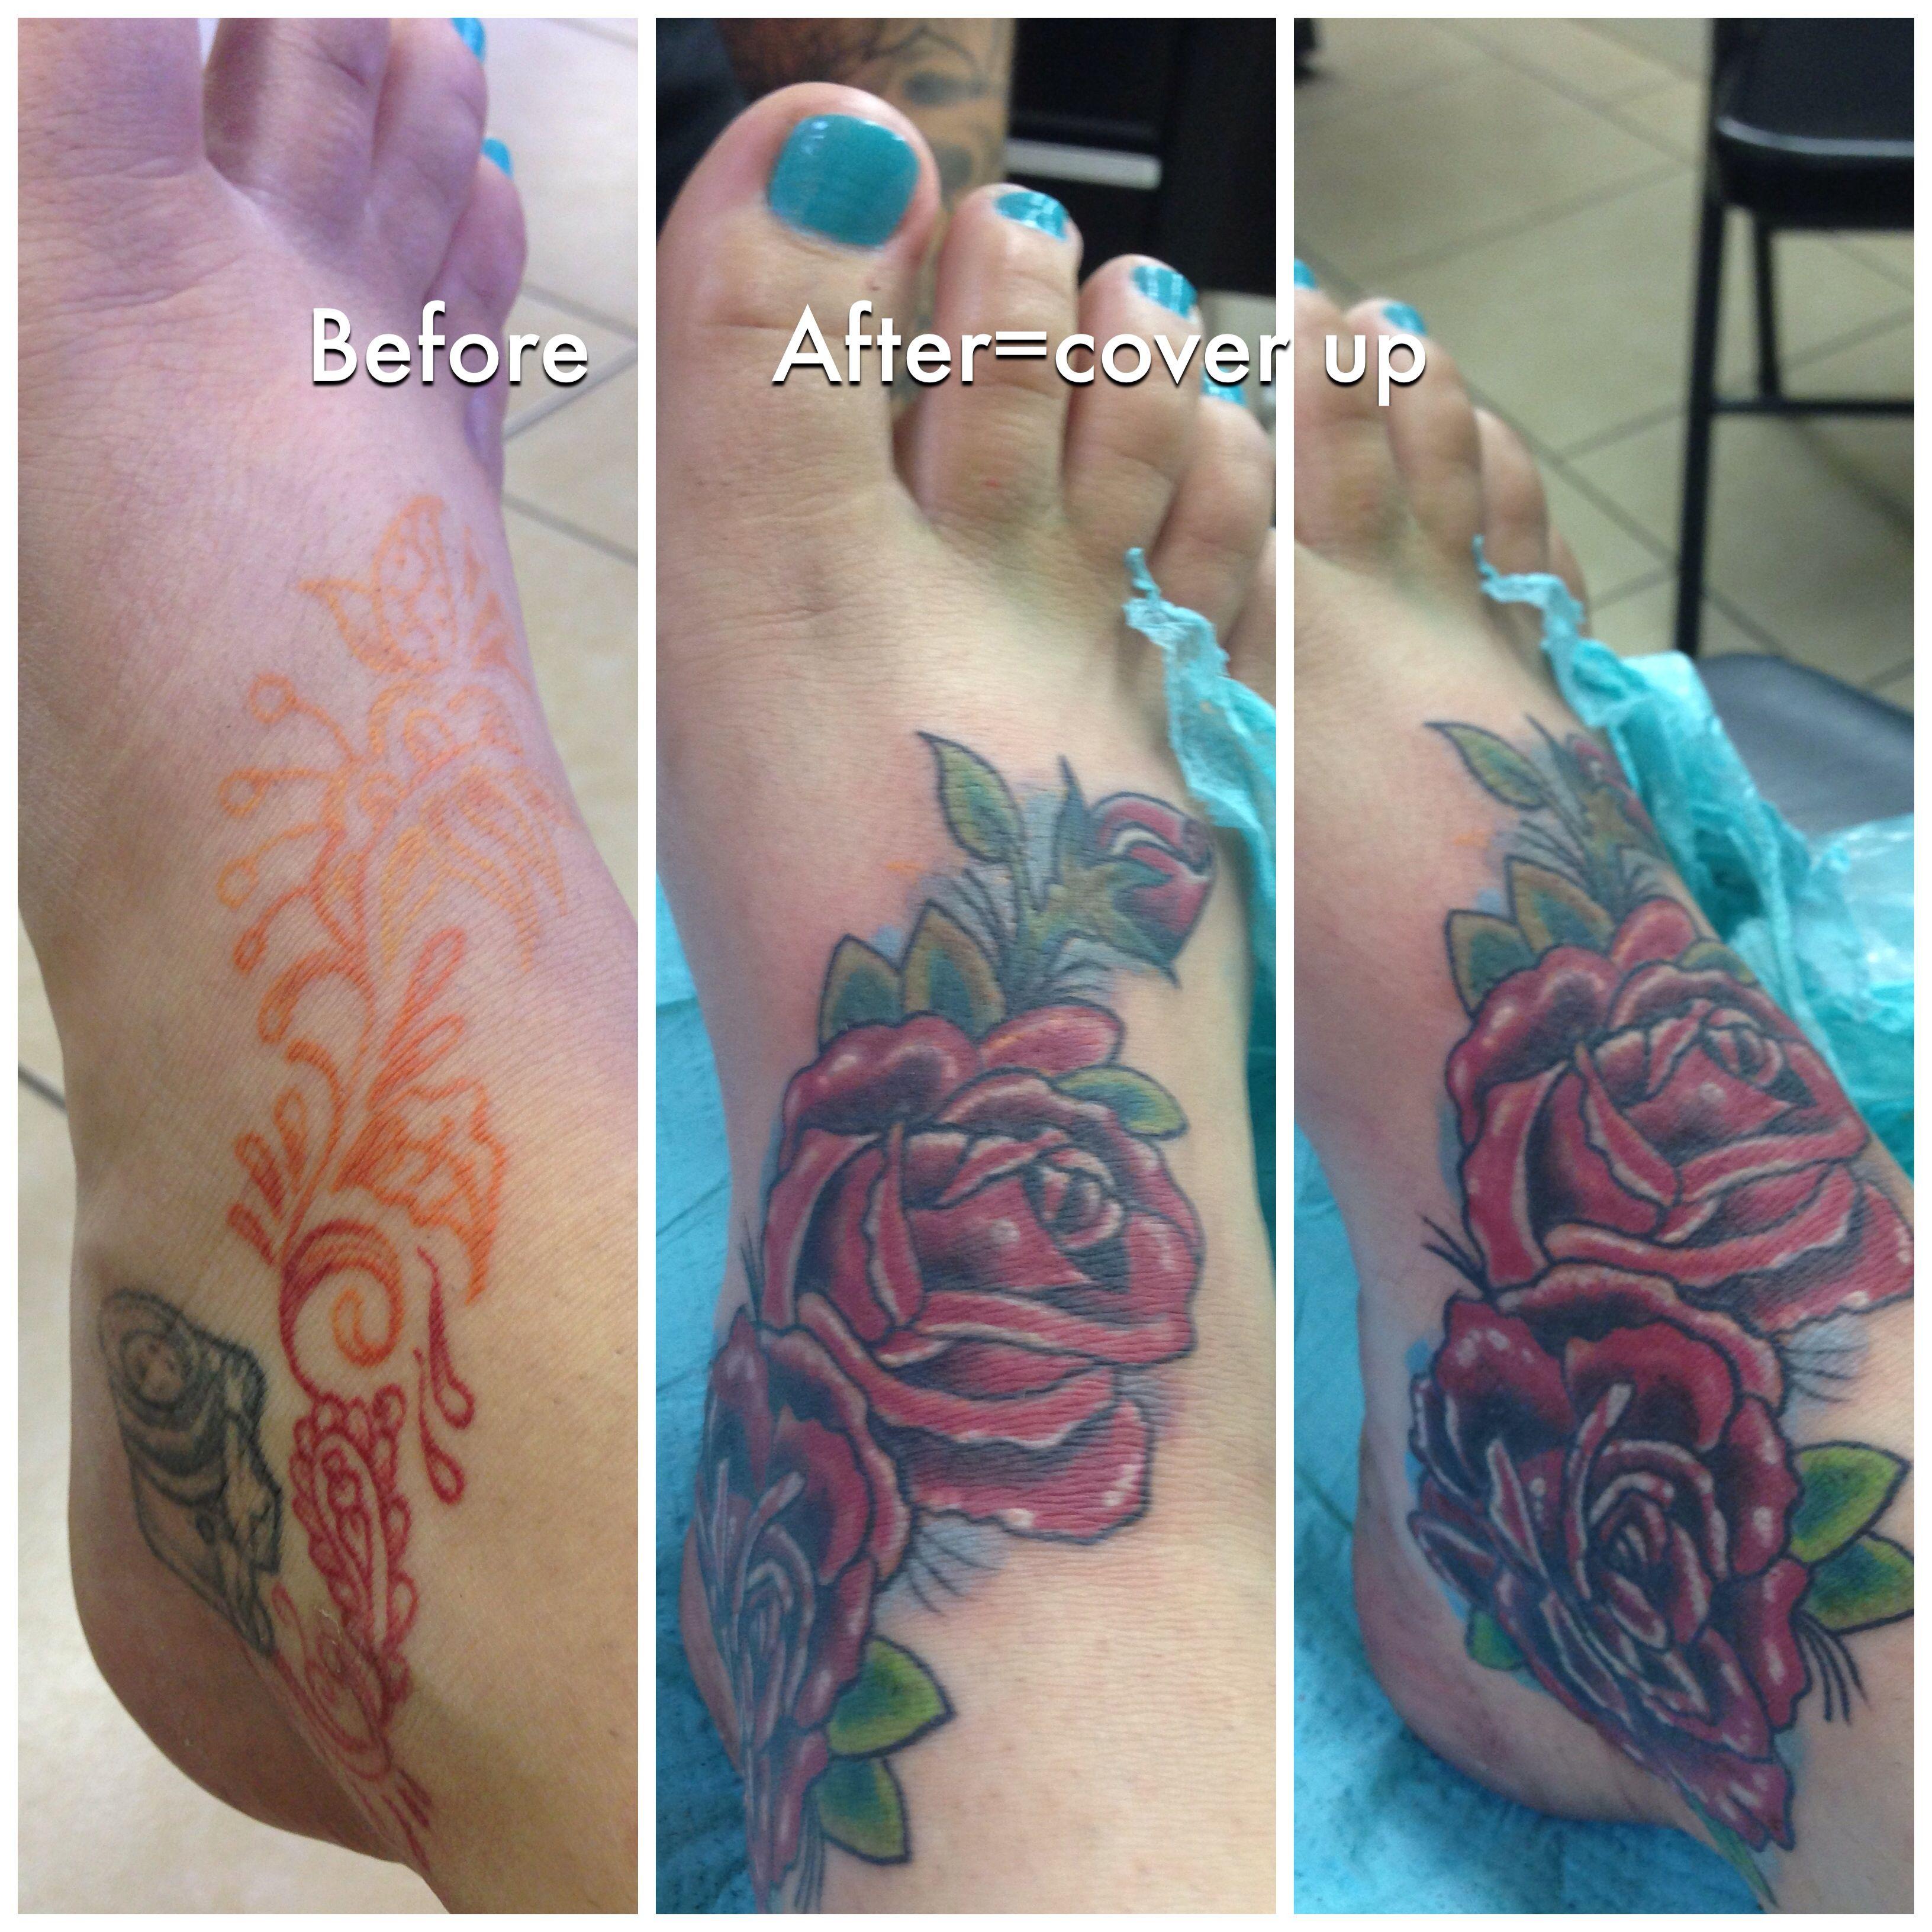 Cover upcaseys tattoo artist caleb due up tattoos